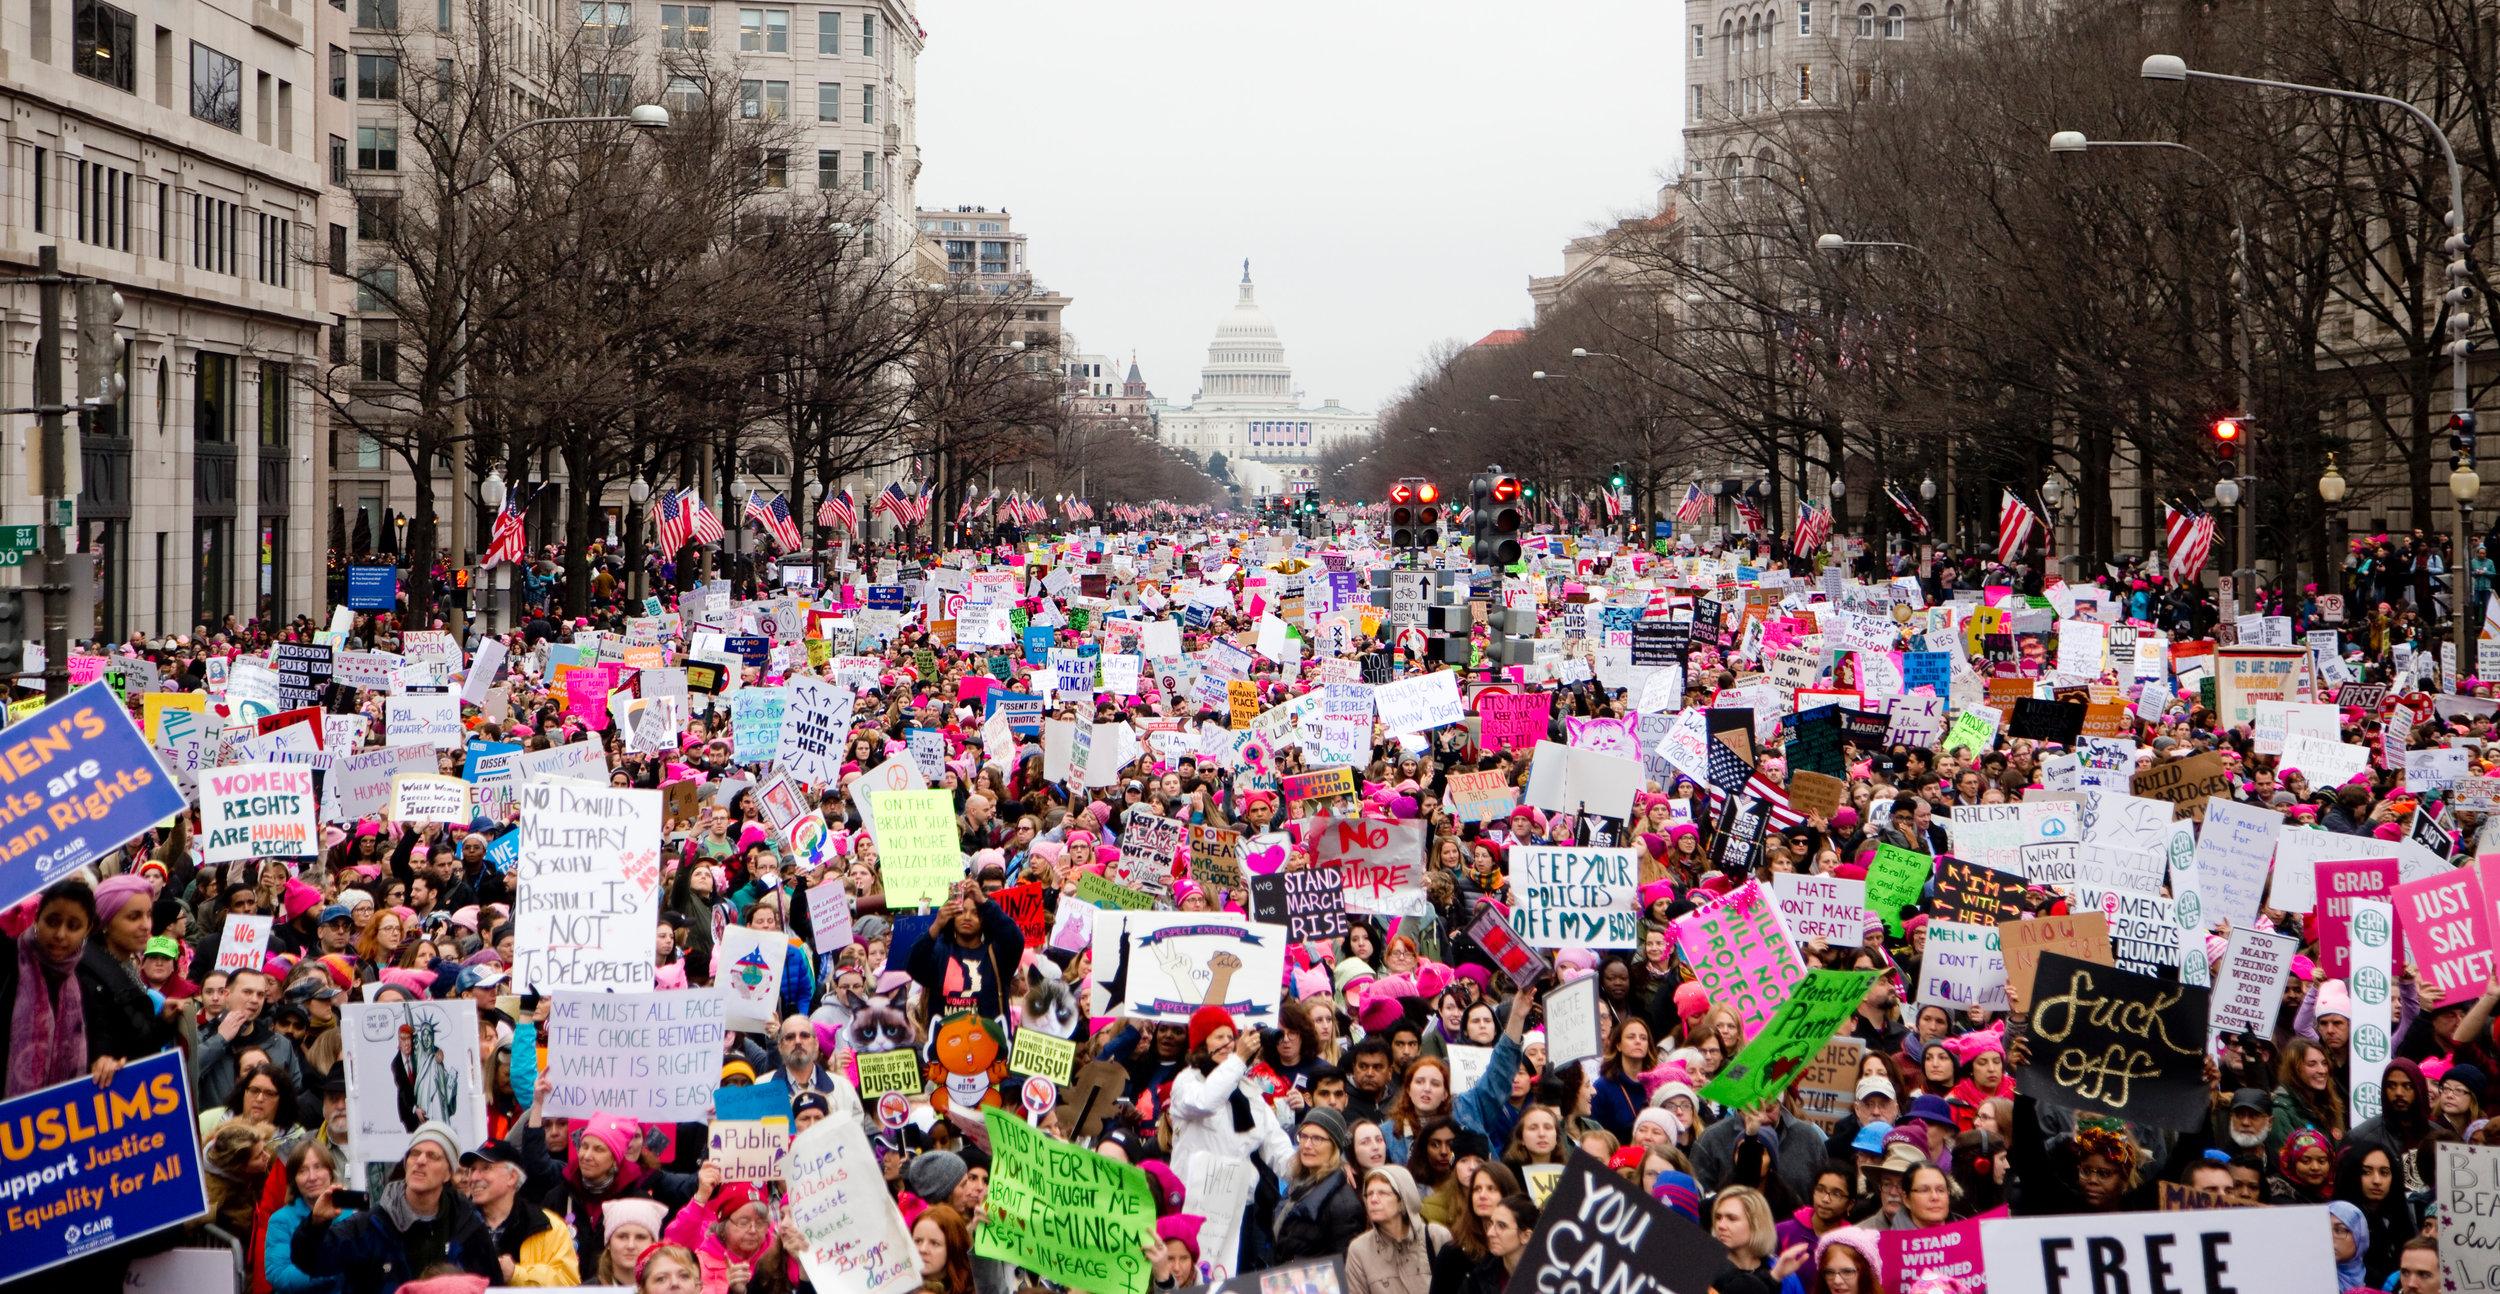 uwm.shutdown.people-crowd-sign-festival-march-demonstration-1393319-pxhere.com